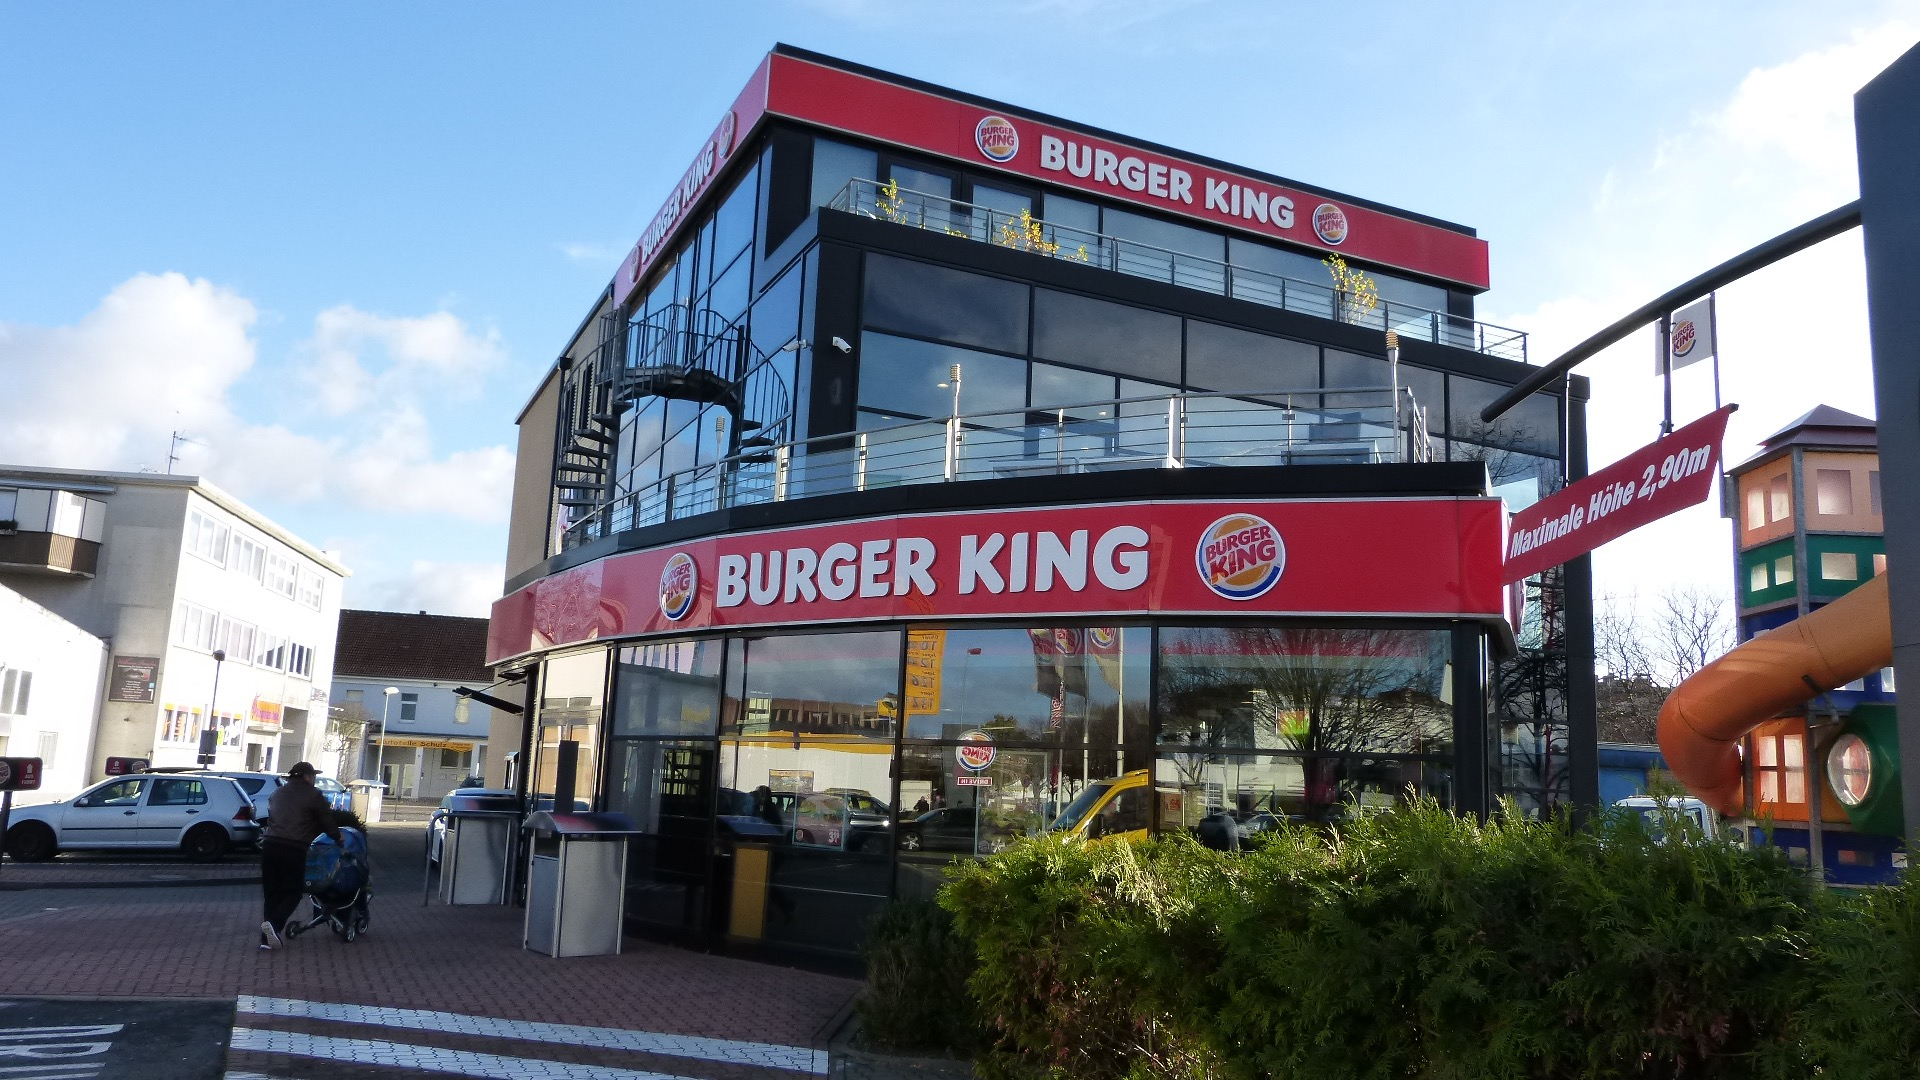 Burger King in Hannover